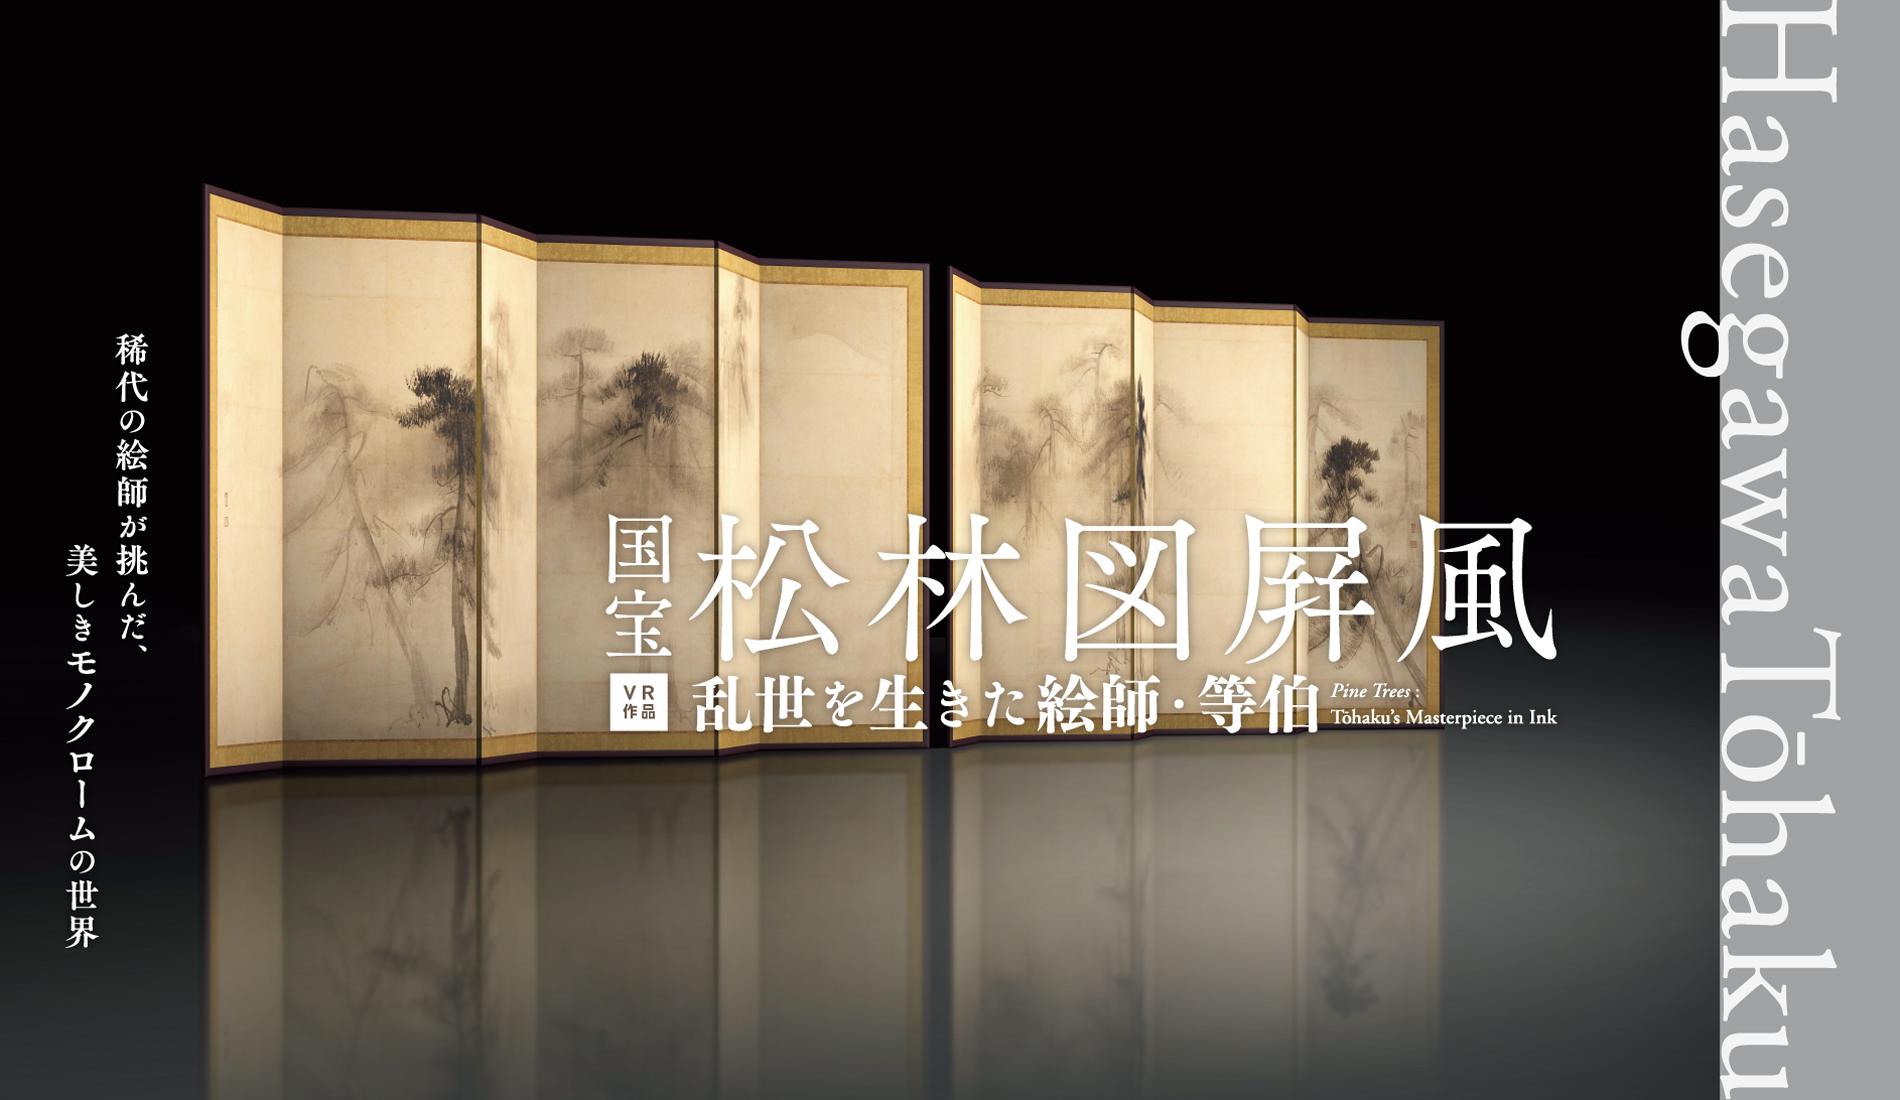 VR作品「国宝 松林図屛風-乱世を生きた絵師・等伯-」